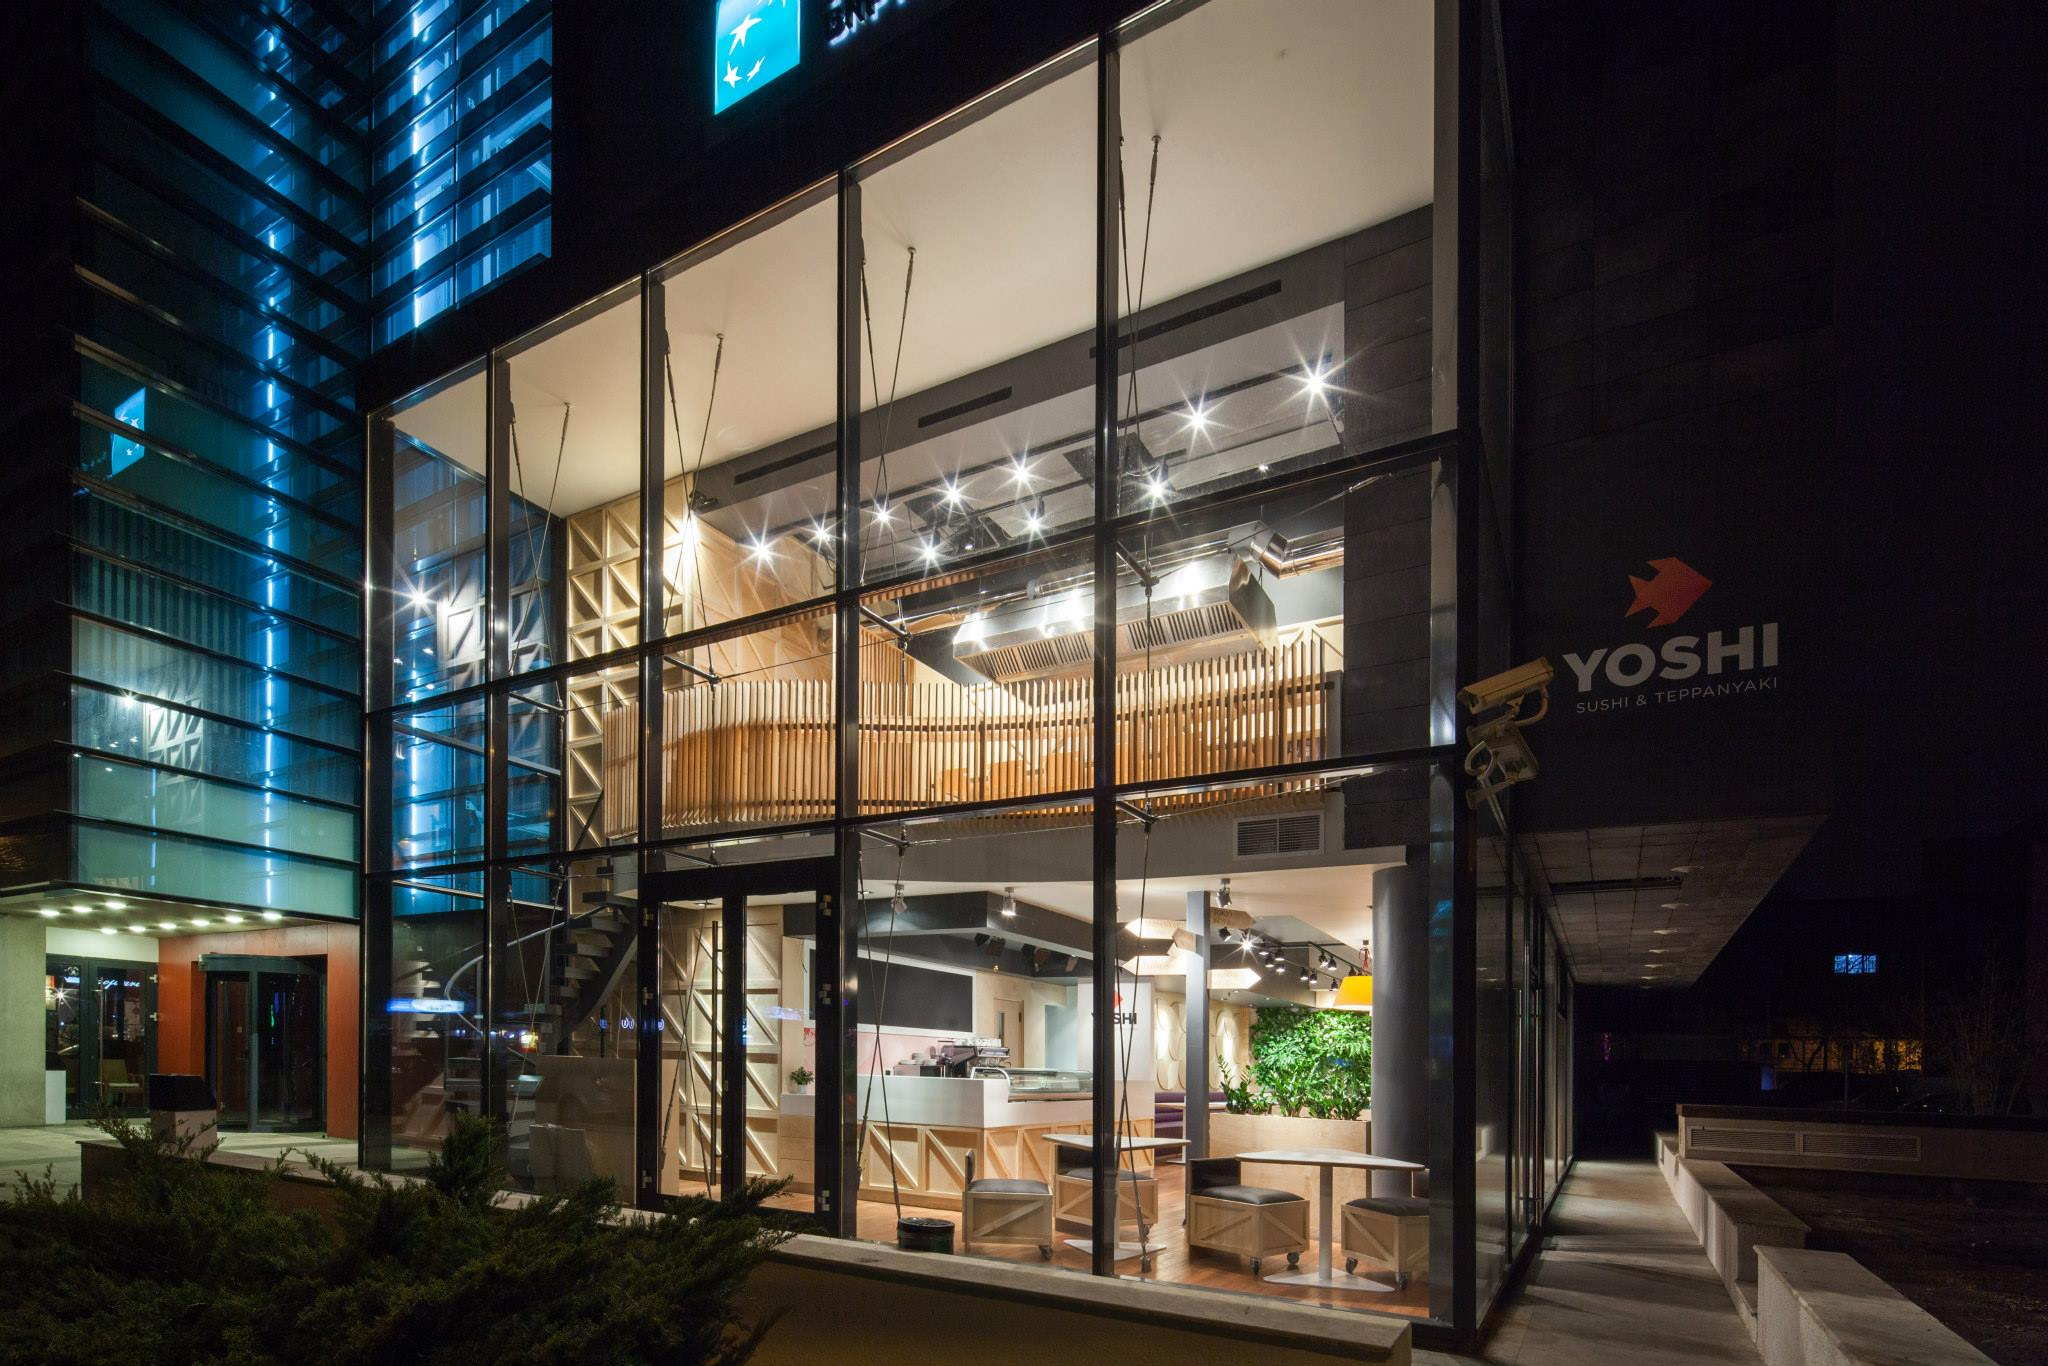 YOSHI-Sushi-Teppanyaki-Trivenus-Ama-Design-23